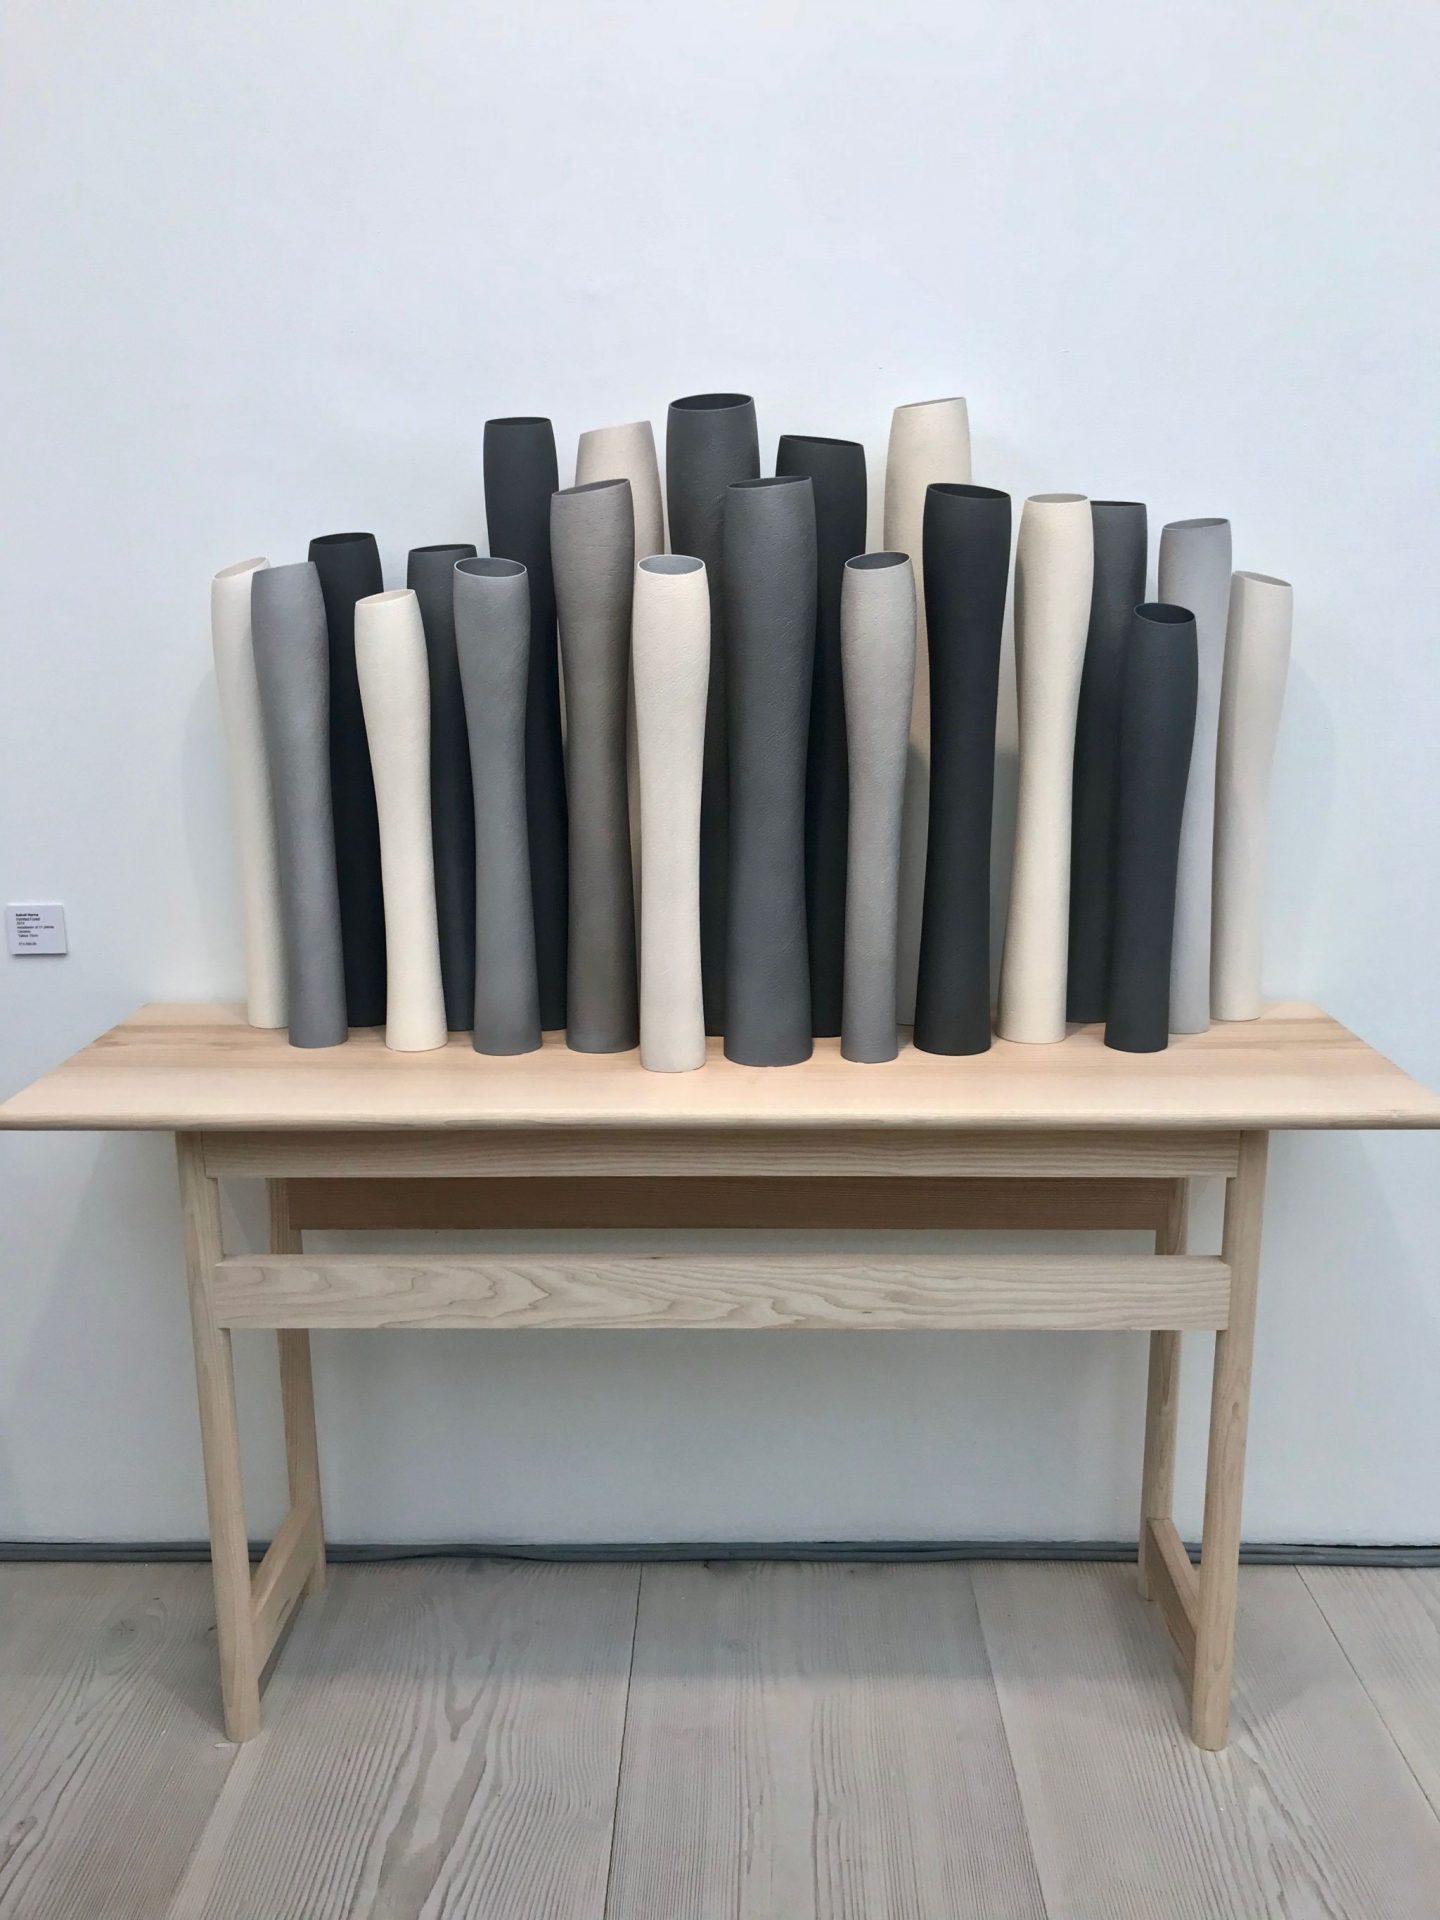 Collect 2018, Contemporary Craft, interiors blog, hellopeagreen, Ashraf Shaw, Cavaliero Finn ceramicist